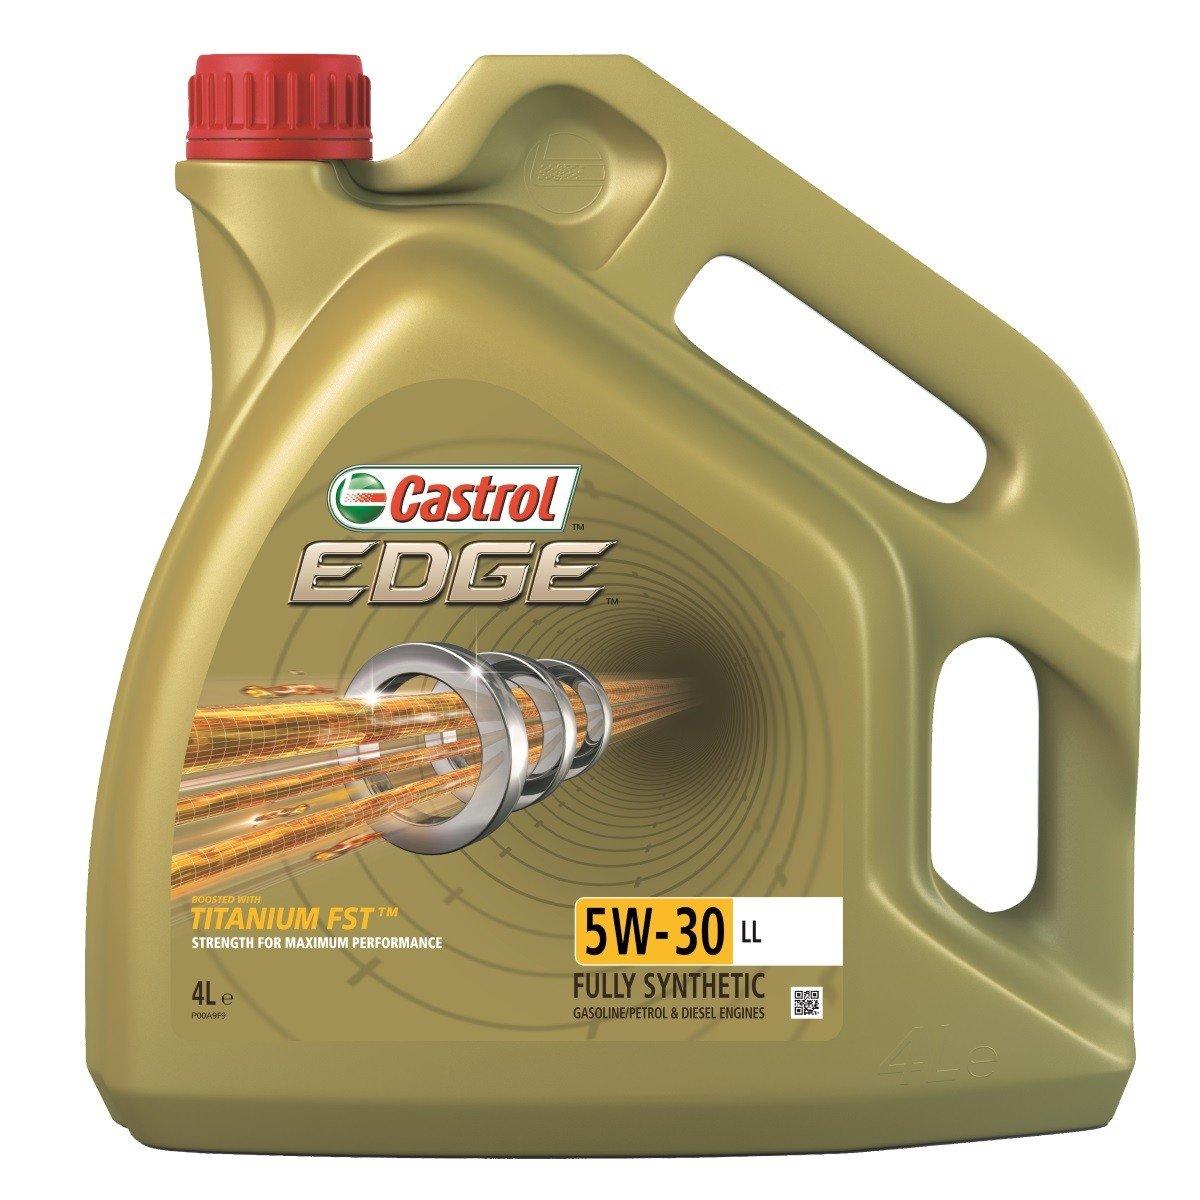 Plně syntetický motorový olej CASTROL Edge 5W30 LL Titanium FST 4L